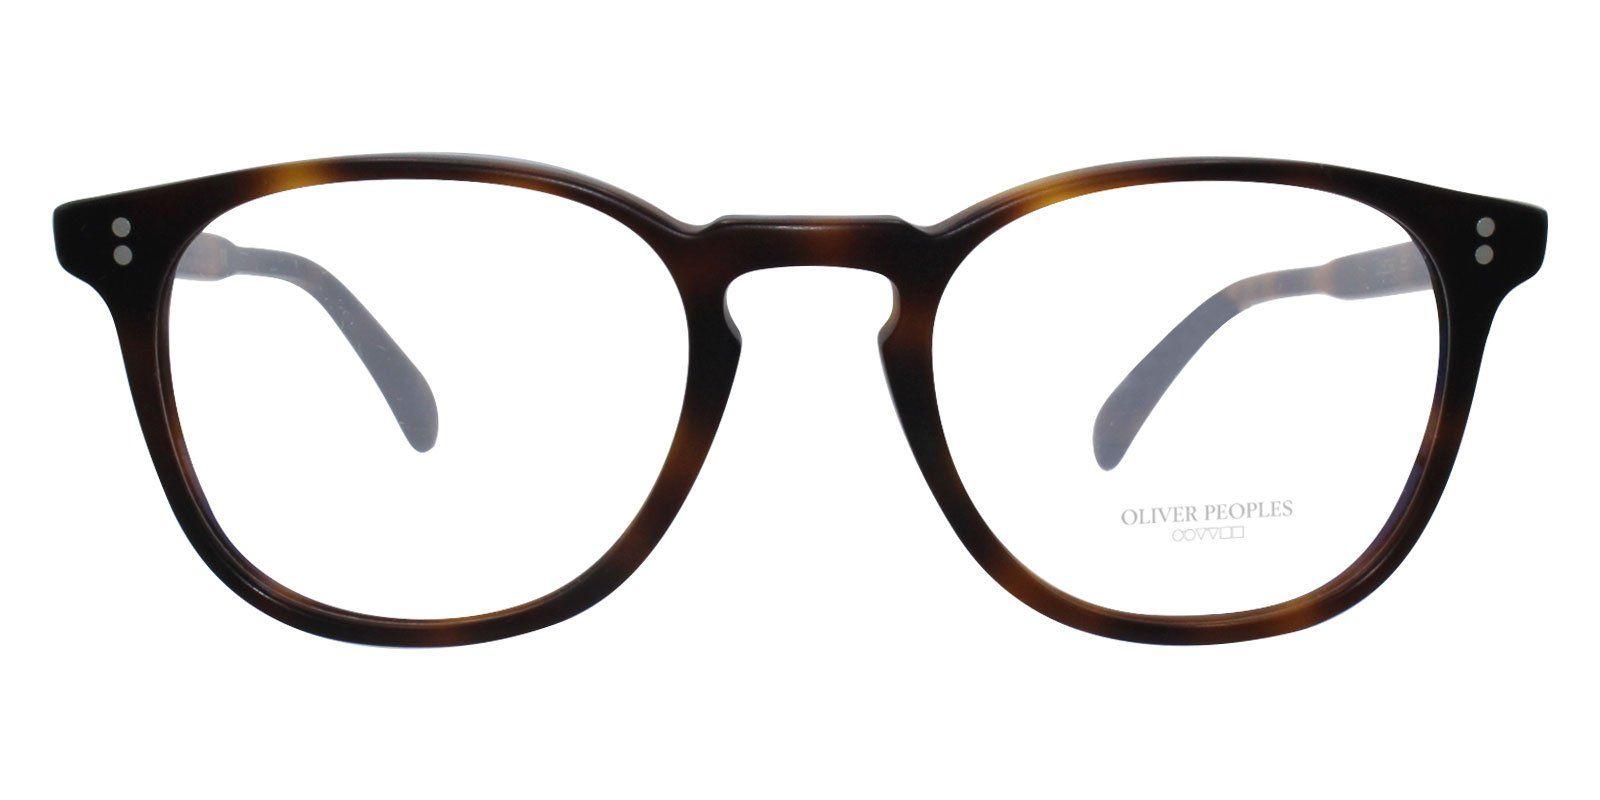 5eff3913df Oliver Peoples Finley Esq Tortoise   Clear Lens Eyeglasses ...